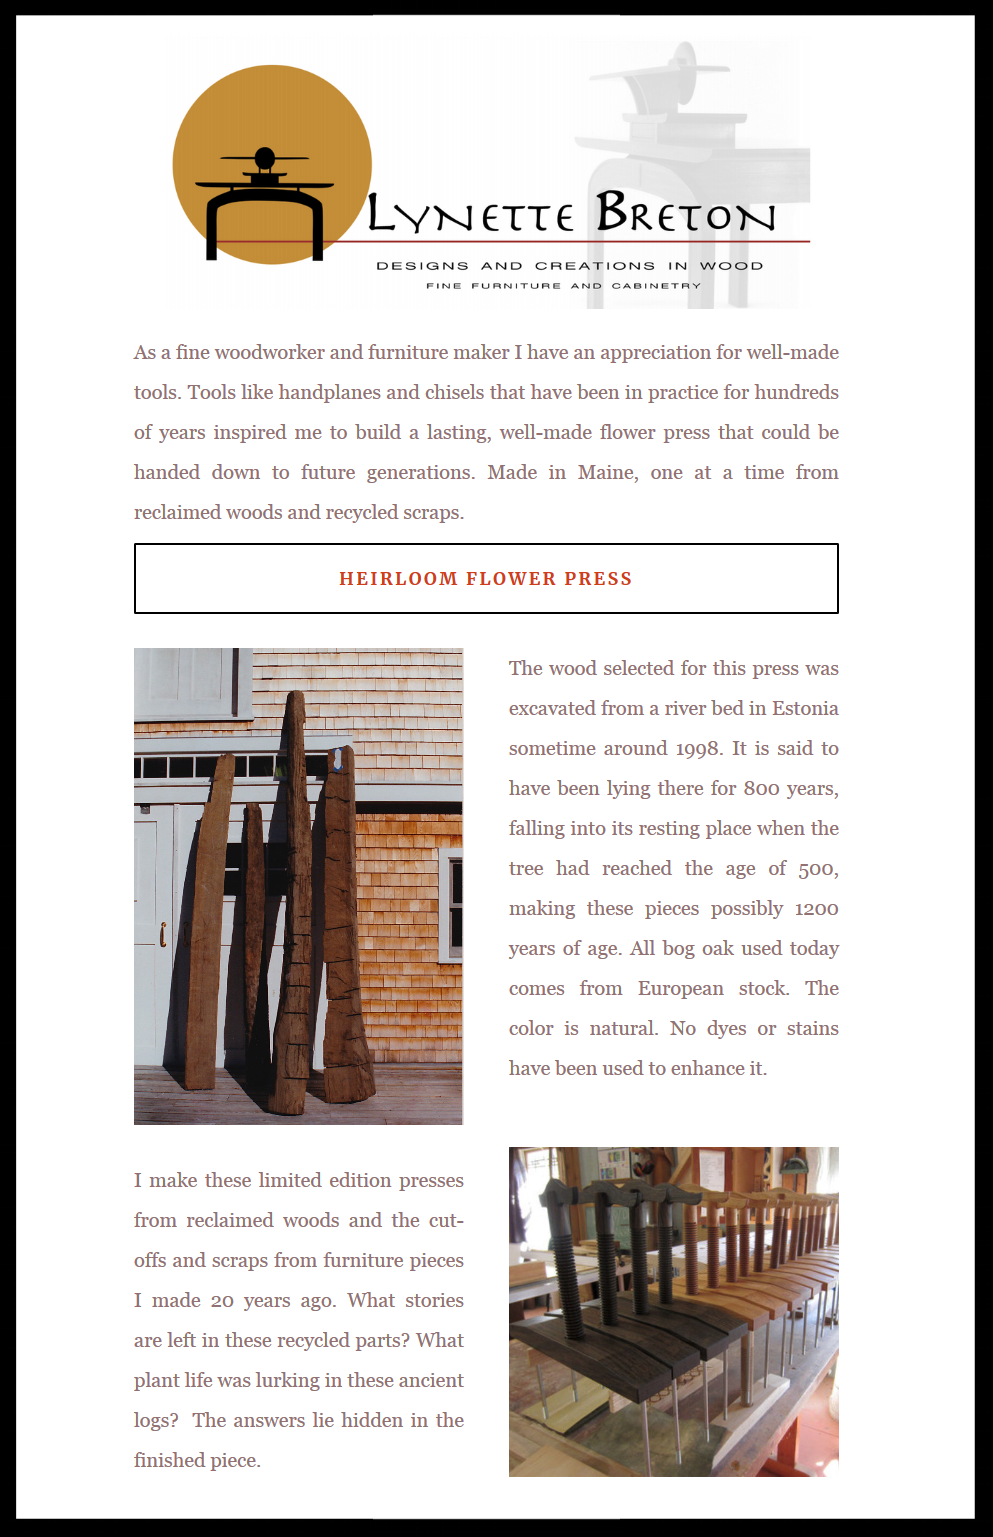 Screenshot-2018-3-29 Lynette Breton Design Flower Press.png